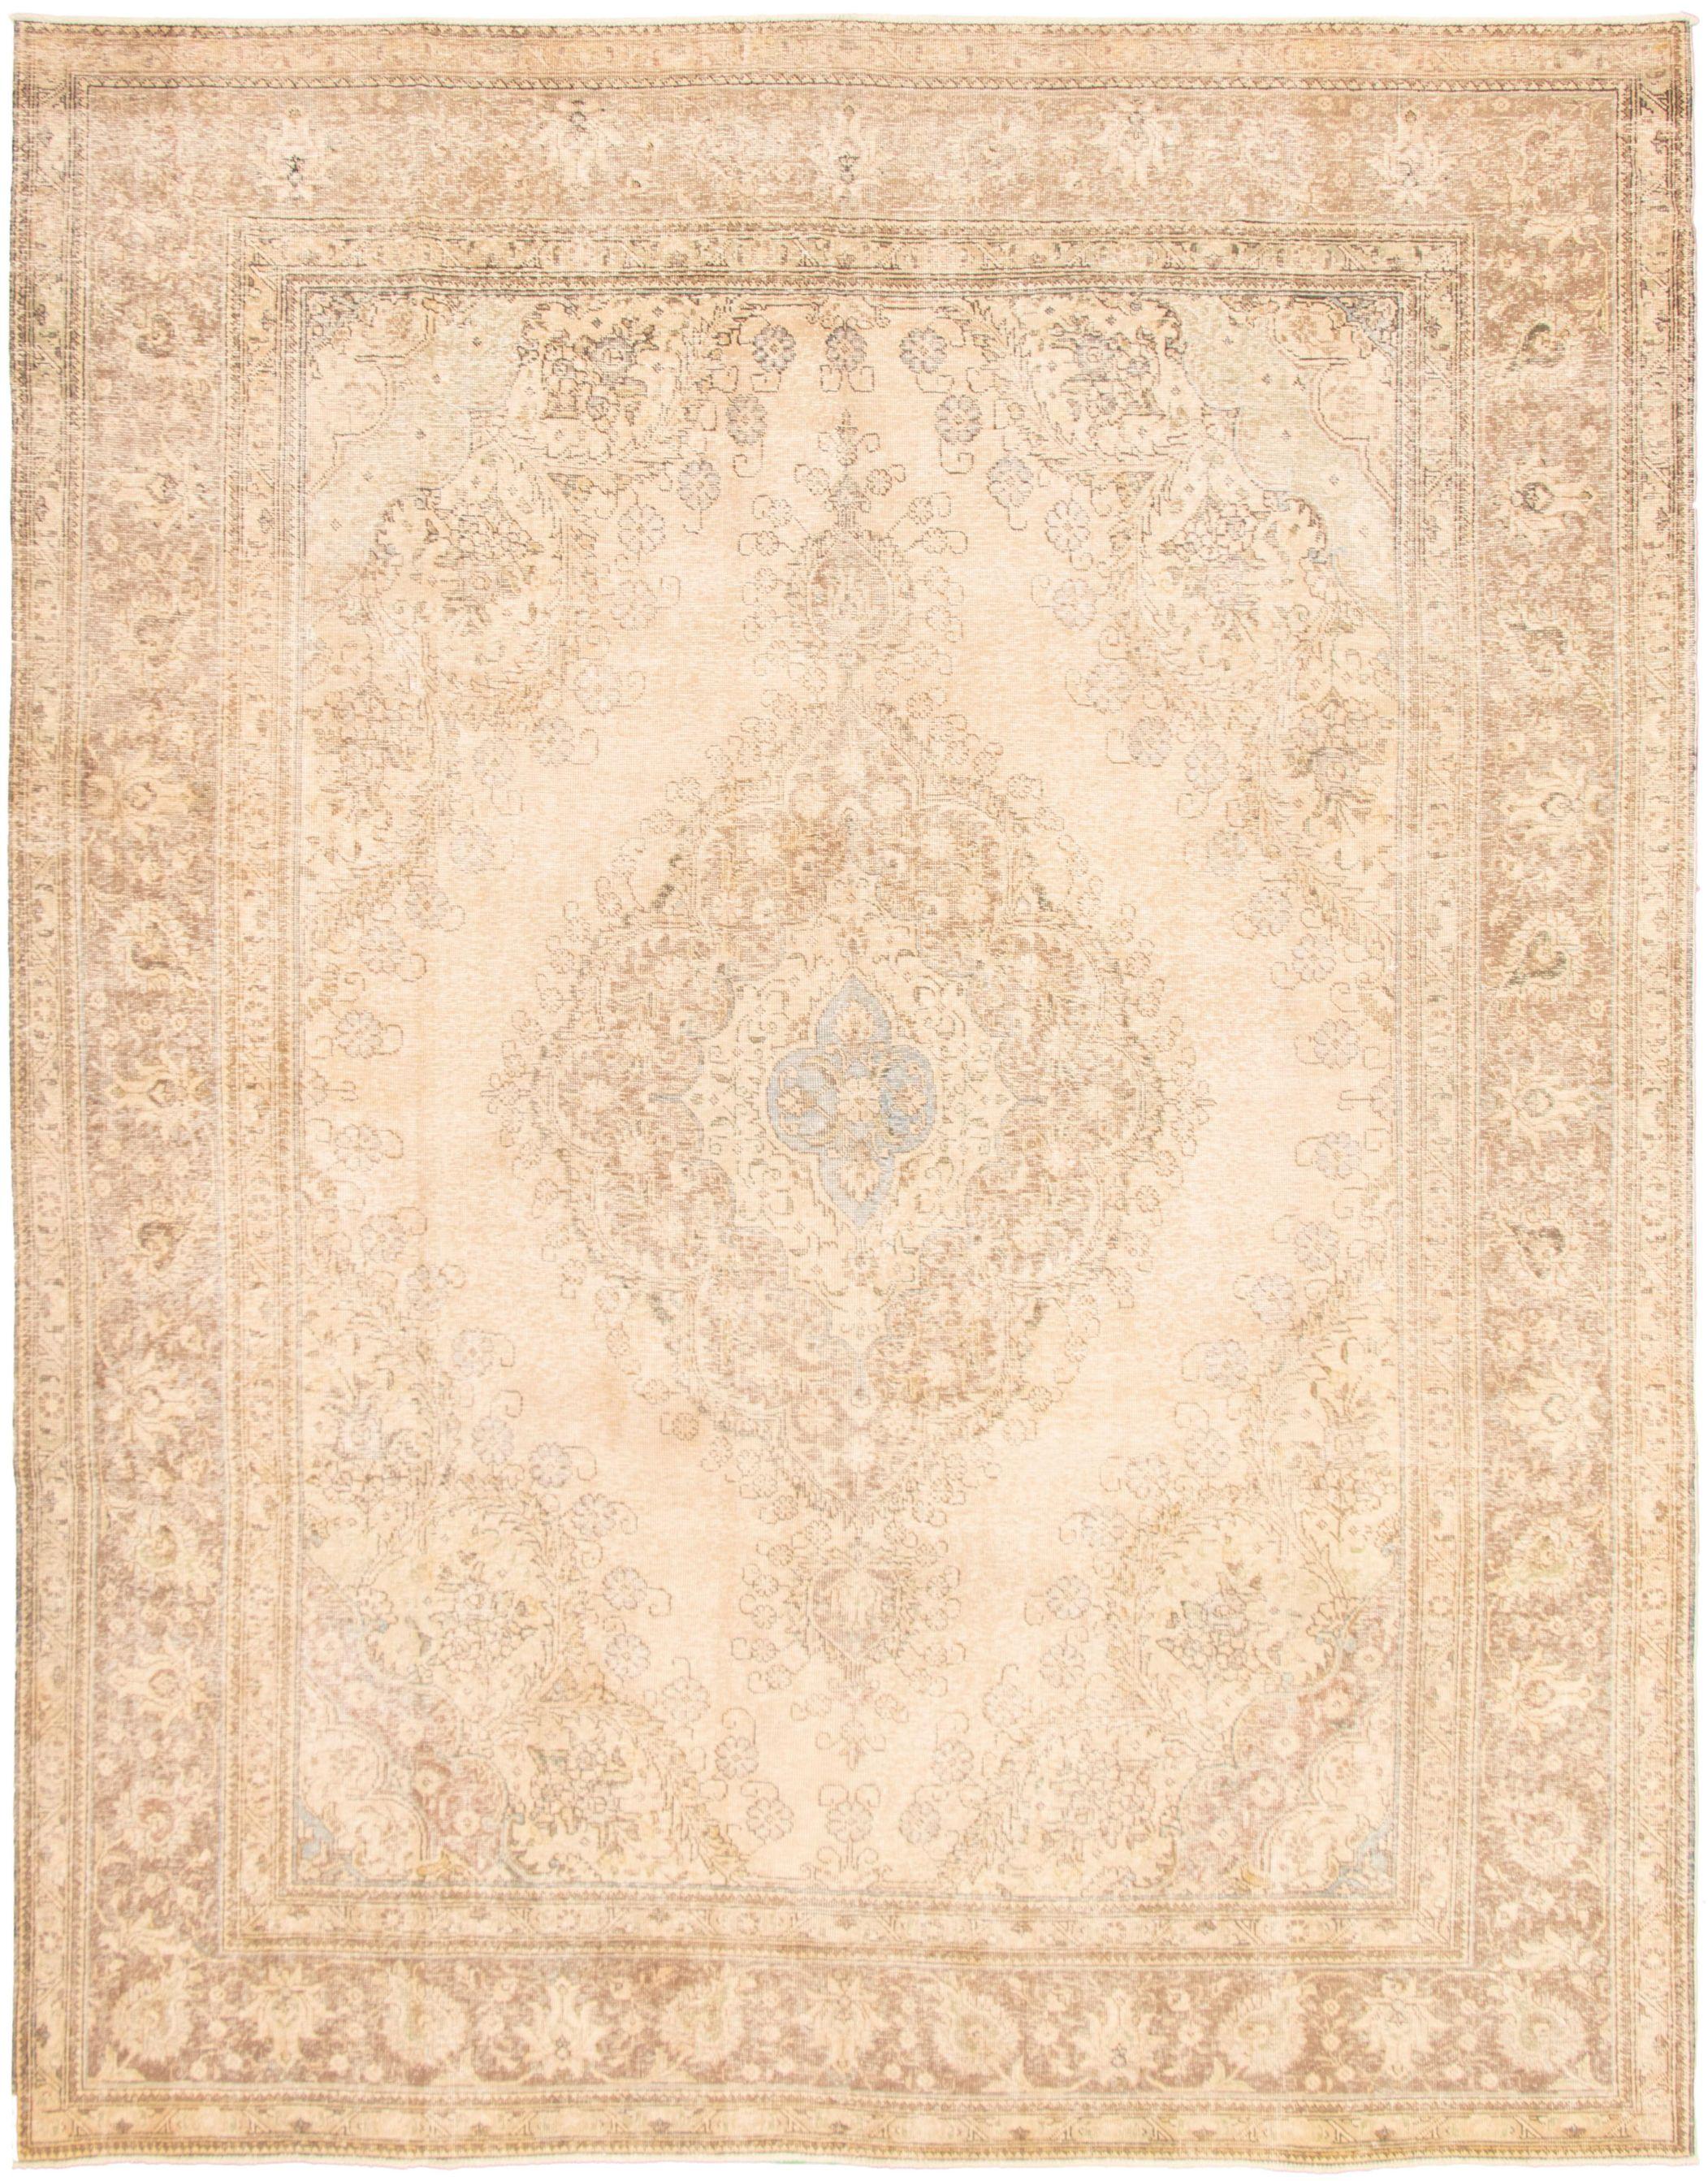 "Hand-knotted Antalya Vintage Light Khaki Wool Rug 9'9"" x 12'6""  Size: 9'9"" x 12'6"""